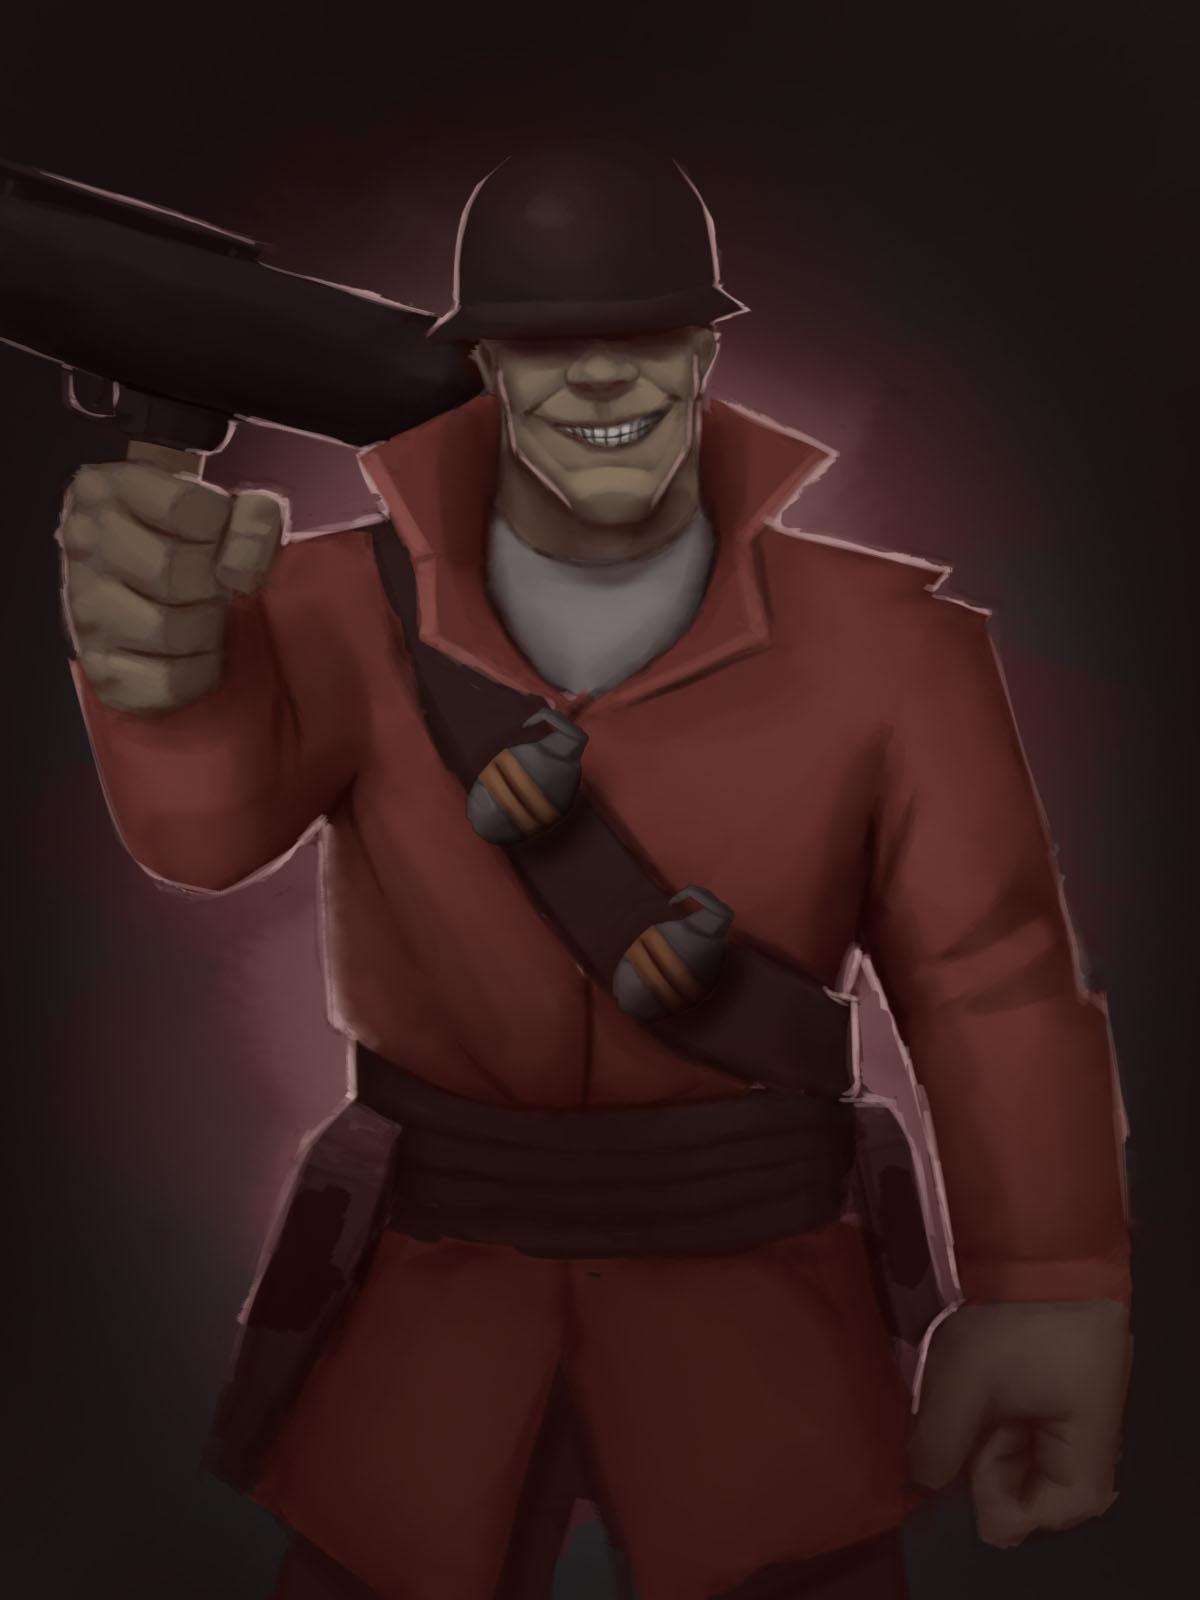 Soldier Team Fortress 2 By Mcarronne On Deviantart